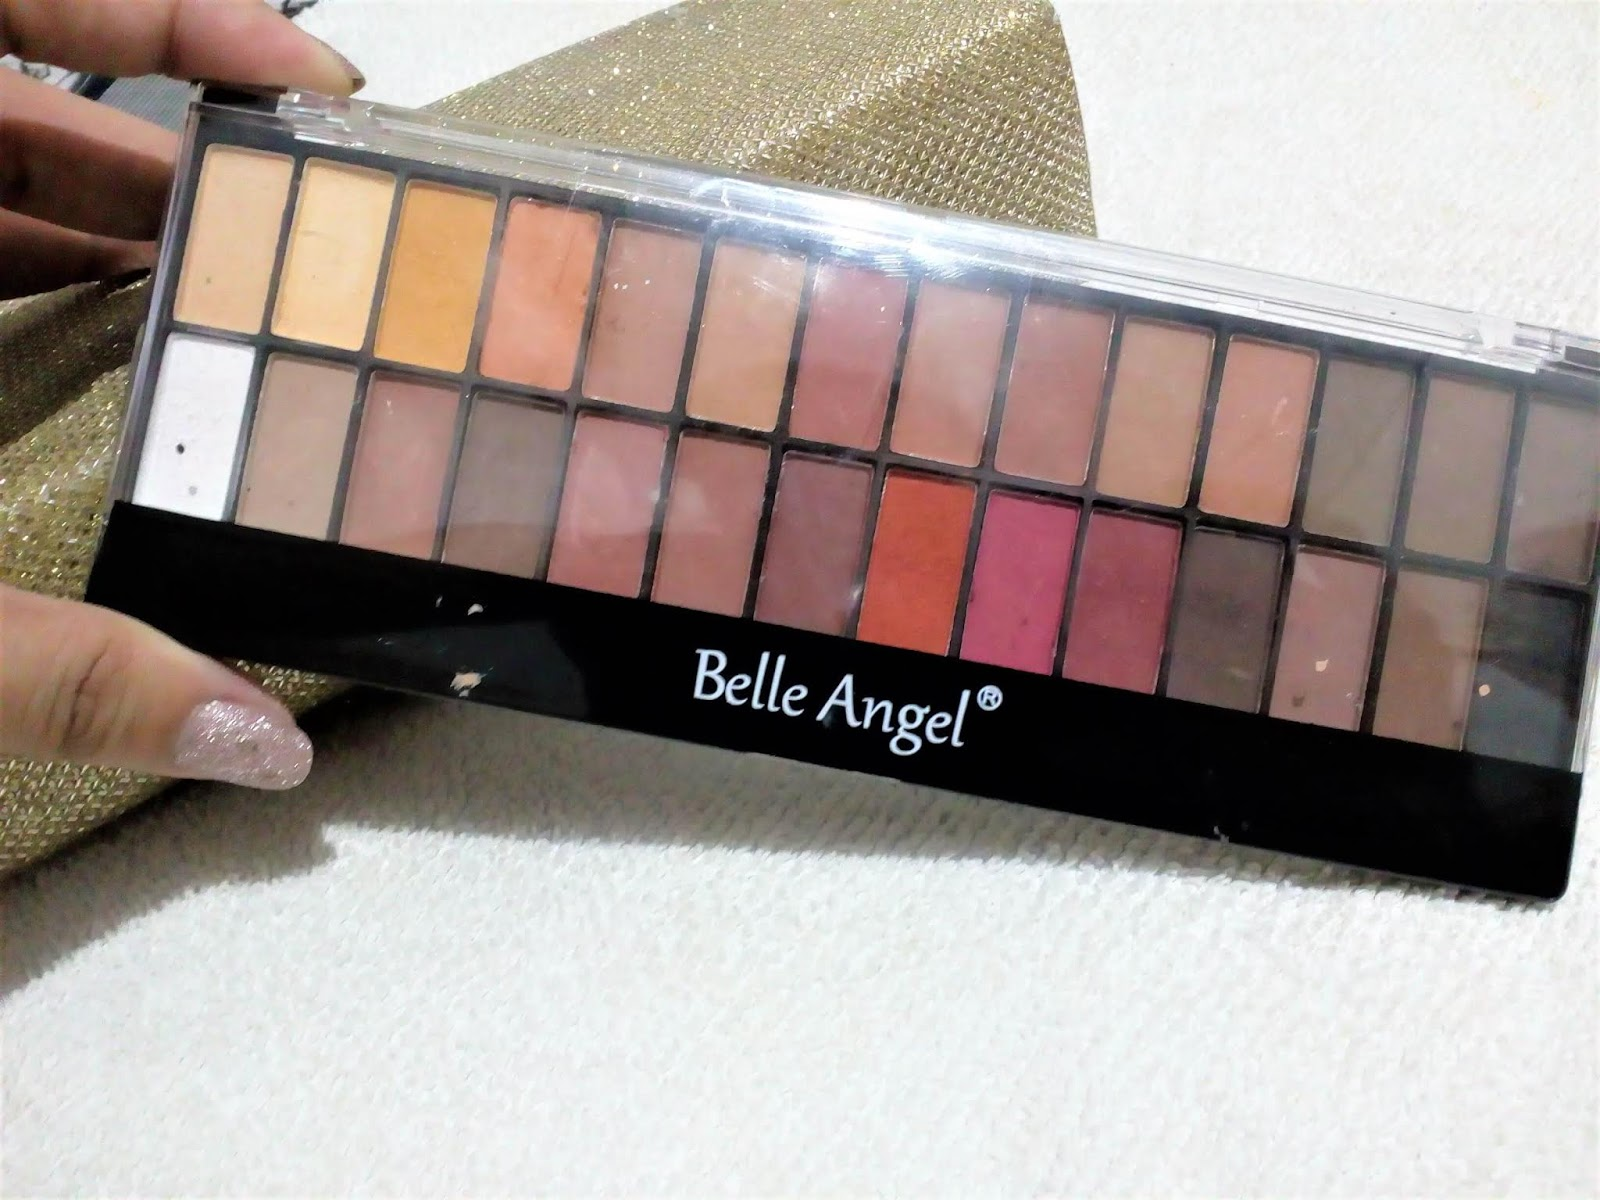 Resenha: Paleta de 28 cores, Belle Angel